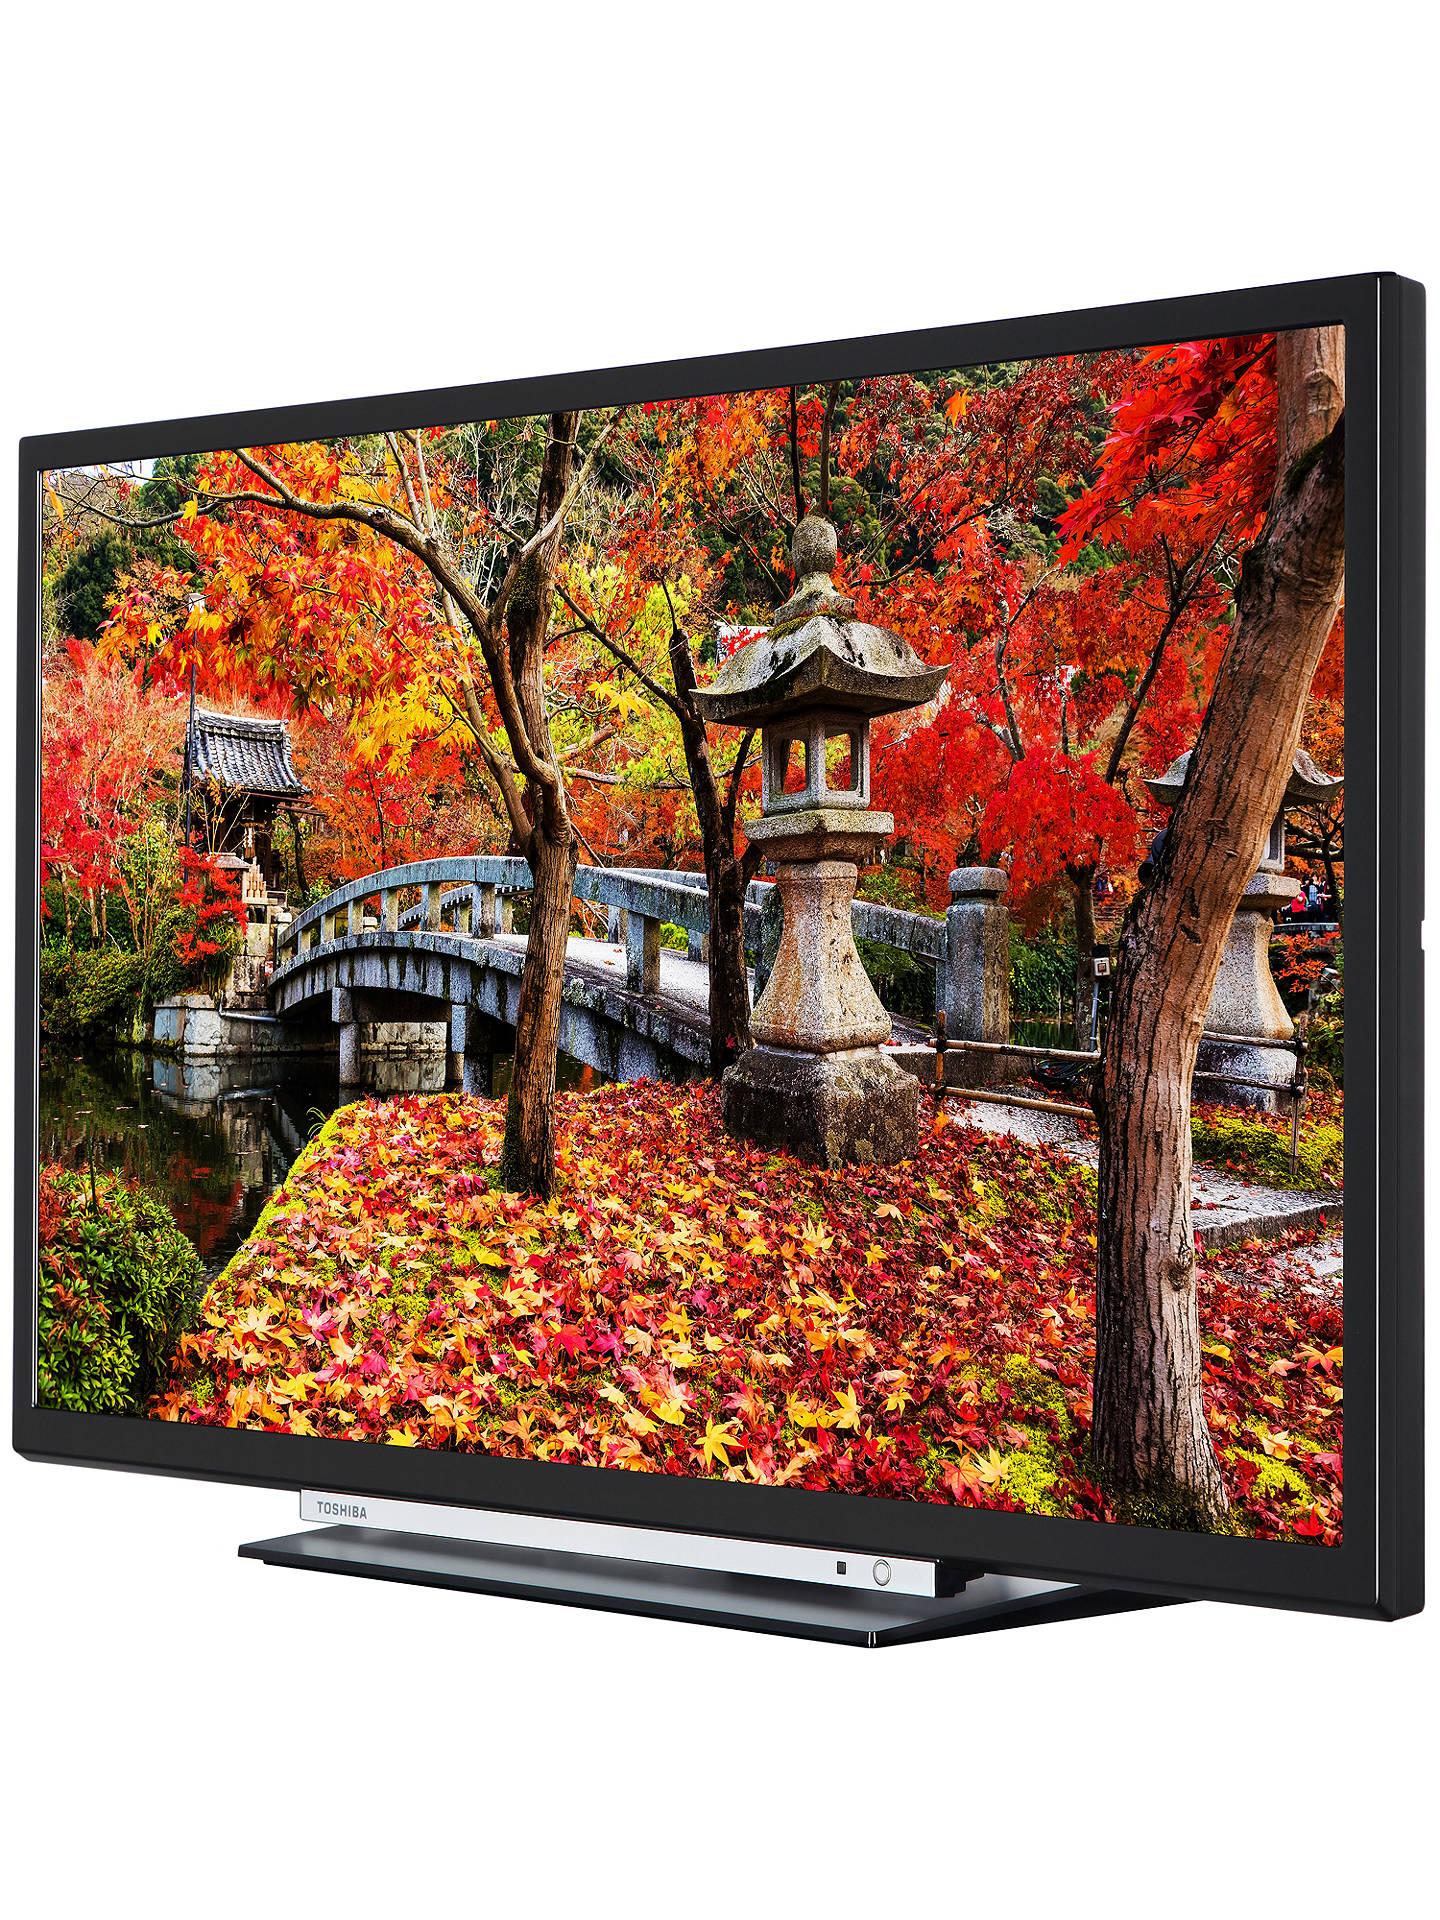 Toshiba 32L3753DB LED Full HD 1080p Smart TV, 32